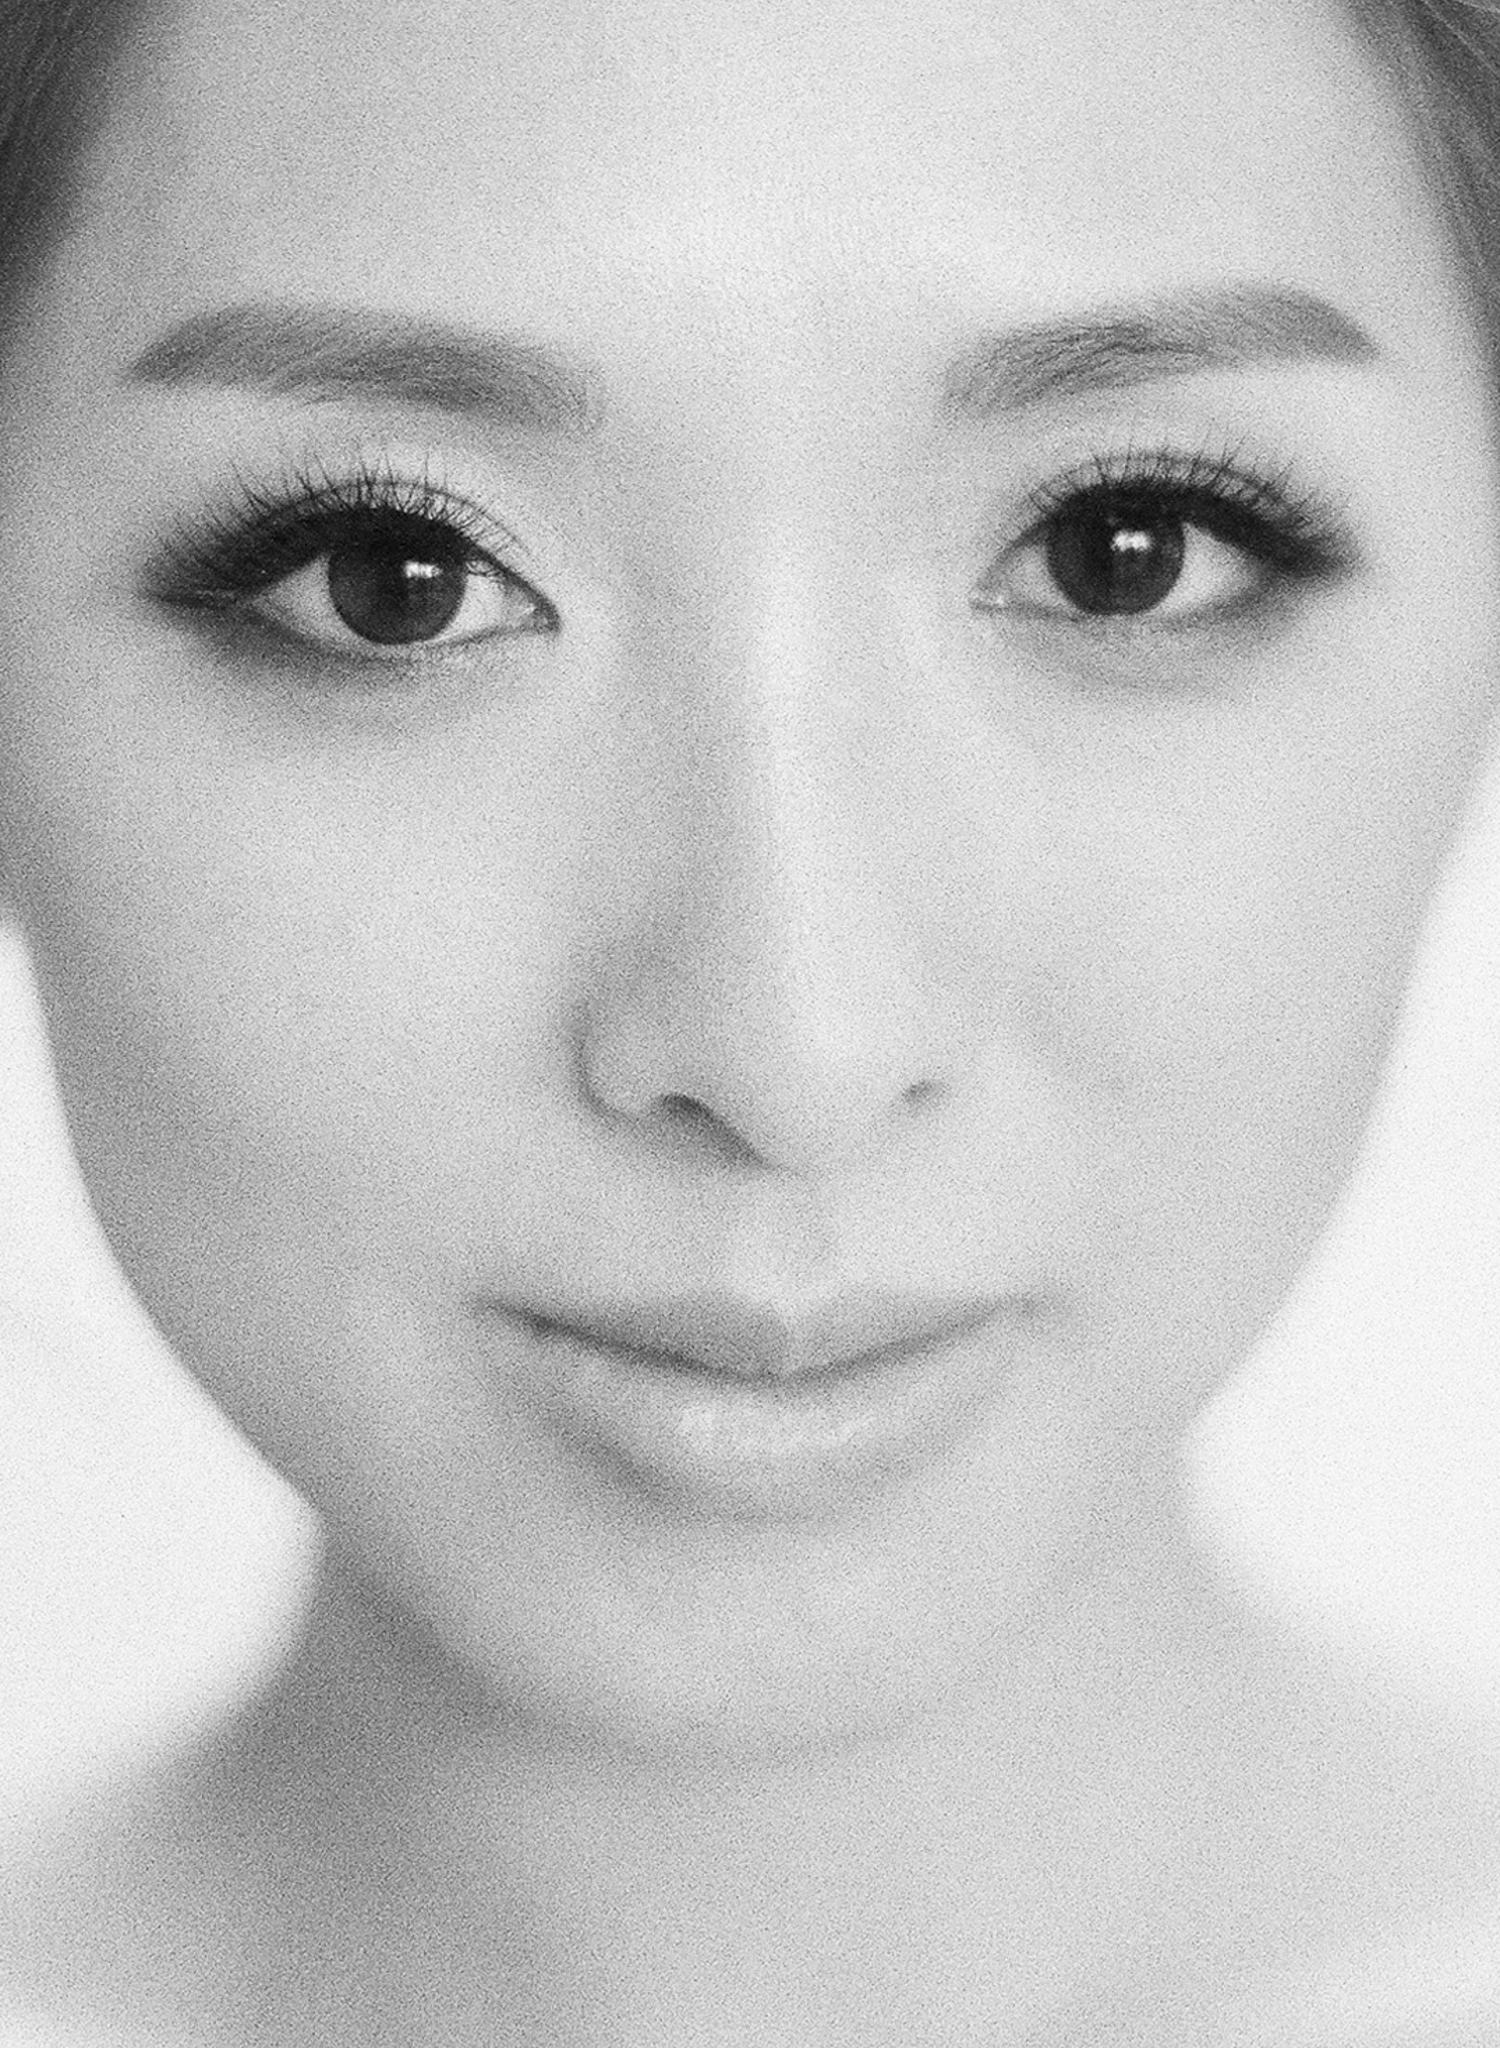 fine-art-portraits-1-Jen_Huang-000012460009.jpg